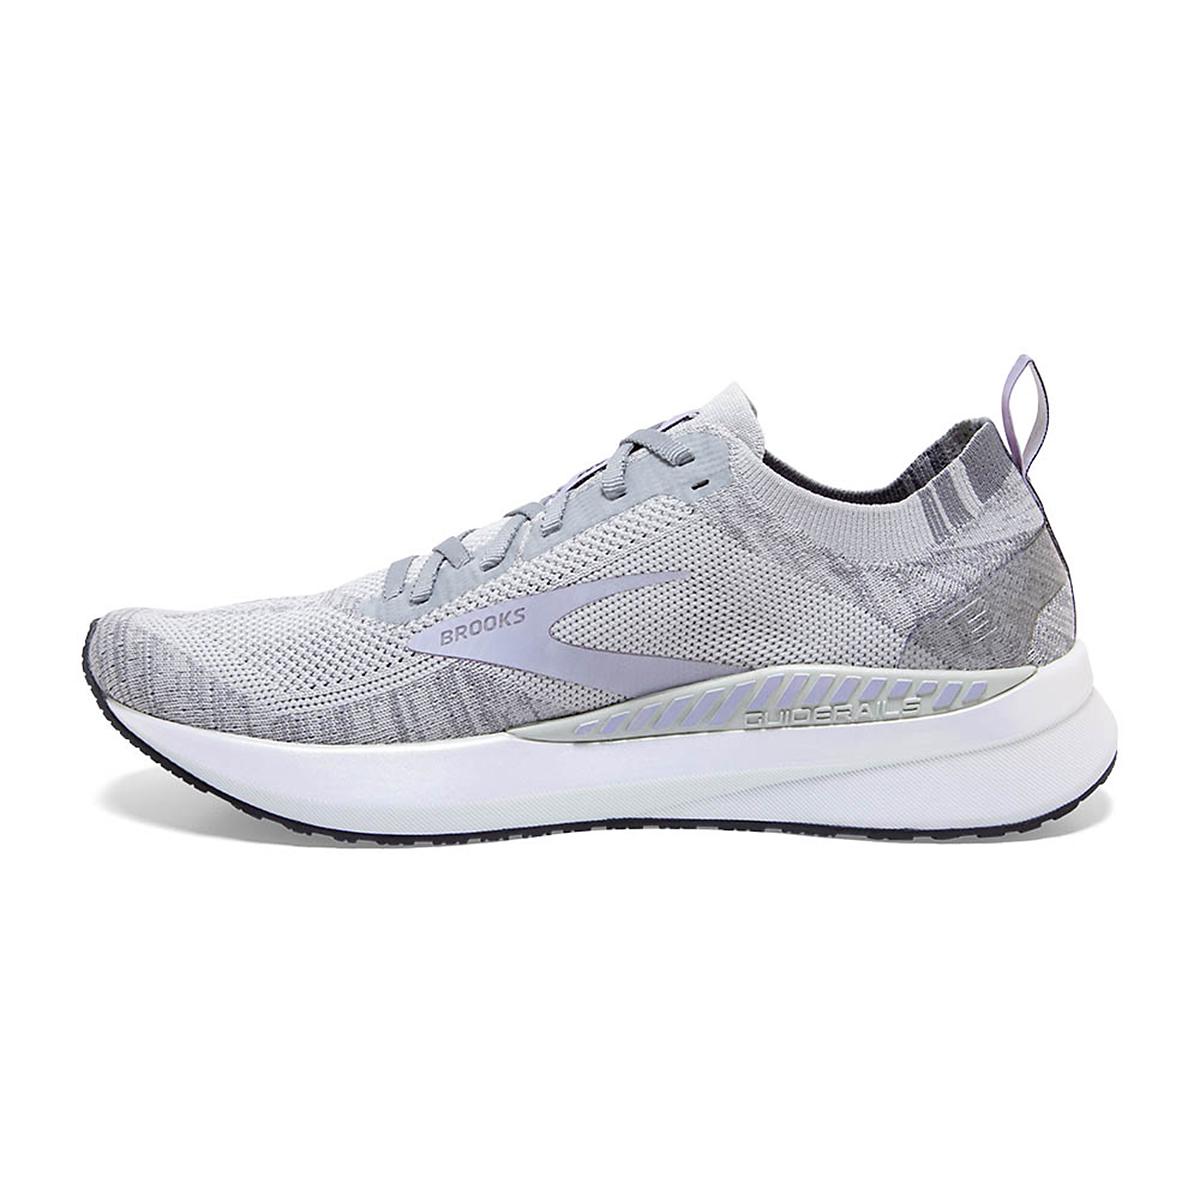 Women's Brooks Bedlam 3 Running Shoe - Color: Oyster/Purple Heather - Size: 5 - Width: Regular, Oyster/Purple Heather, large, image 2